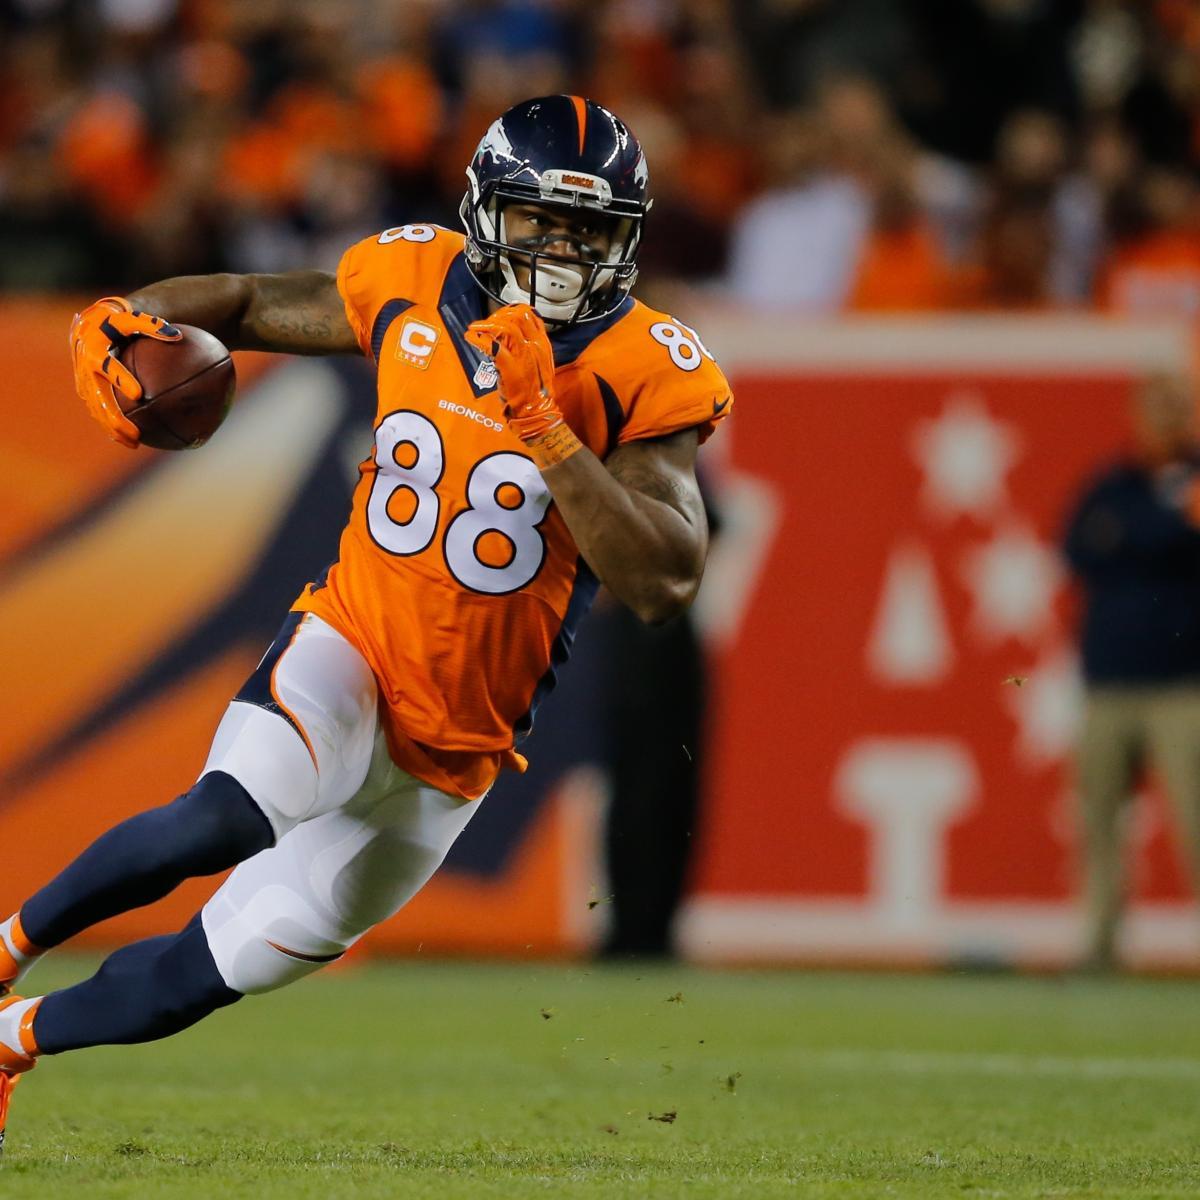 San Diego Chargers Denver Broncos Score: Denver Broncos Vs. San Diego Chargers: Live Denver Score